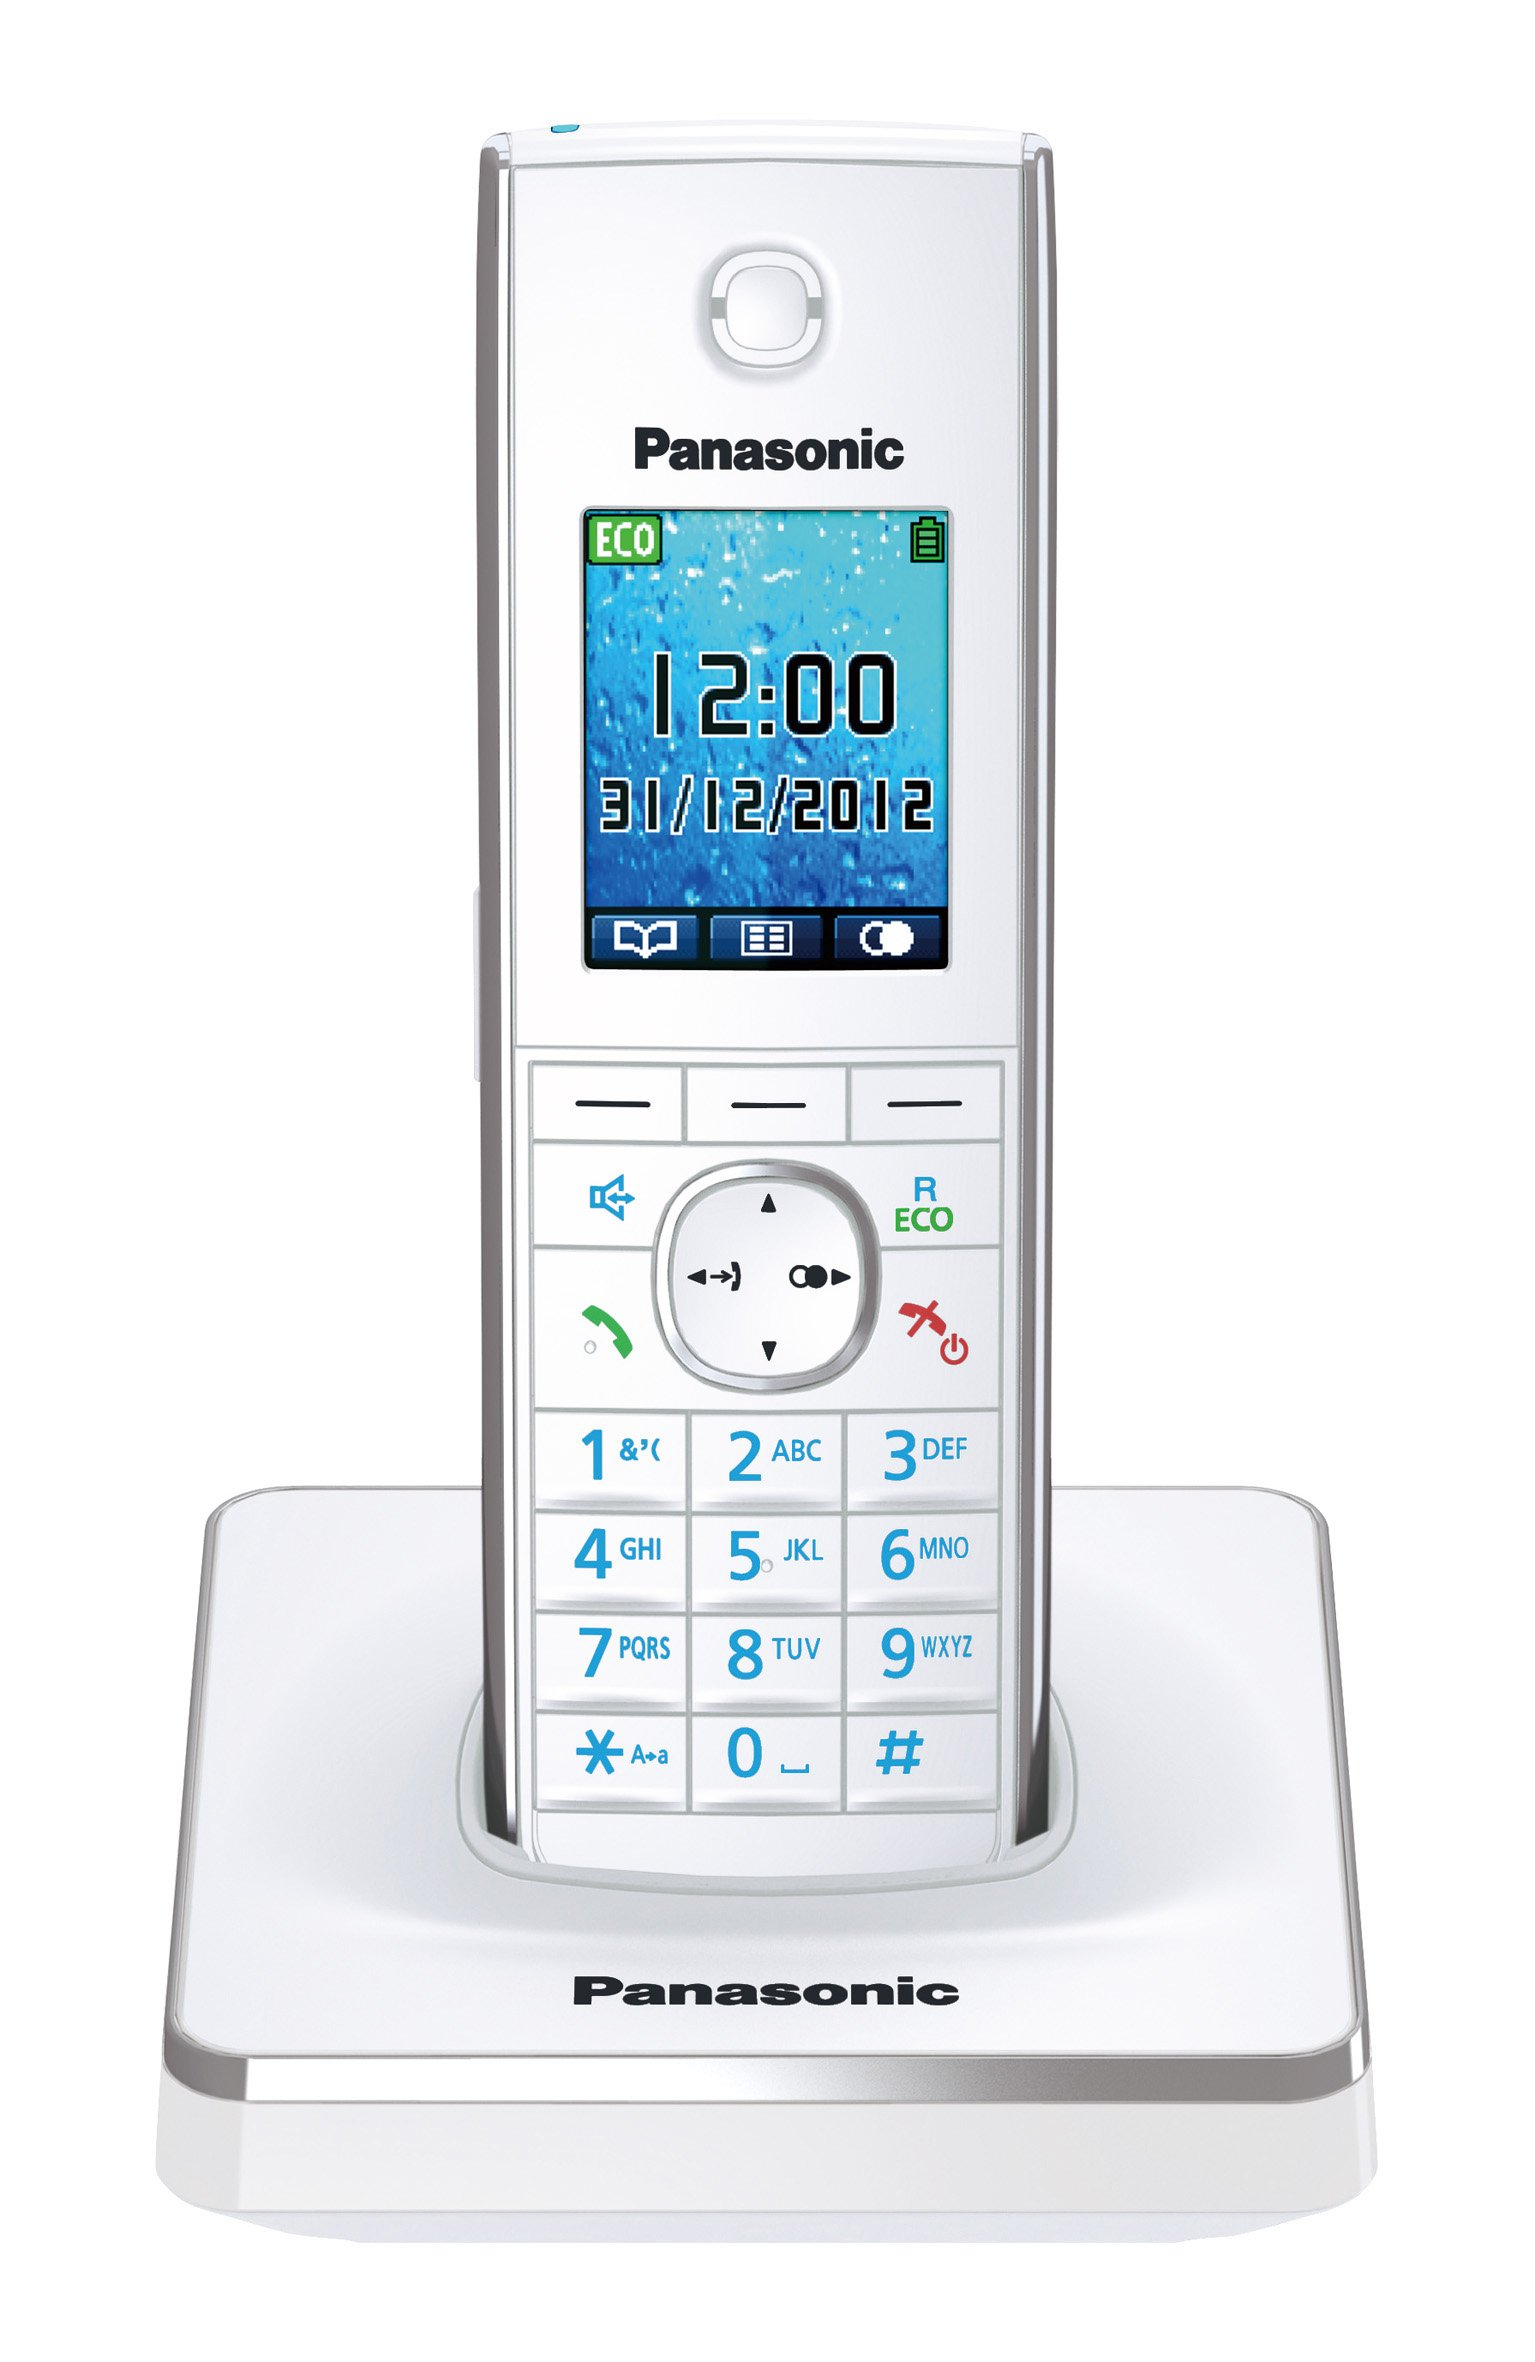 Panasonic KX-TG8551GW - Teléfono inalámbrico, pantalla de 4.6 cm, 1.8